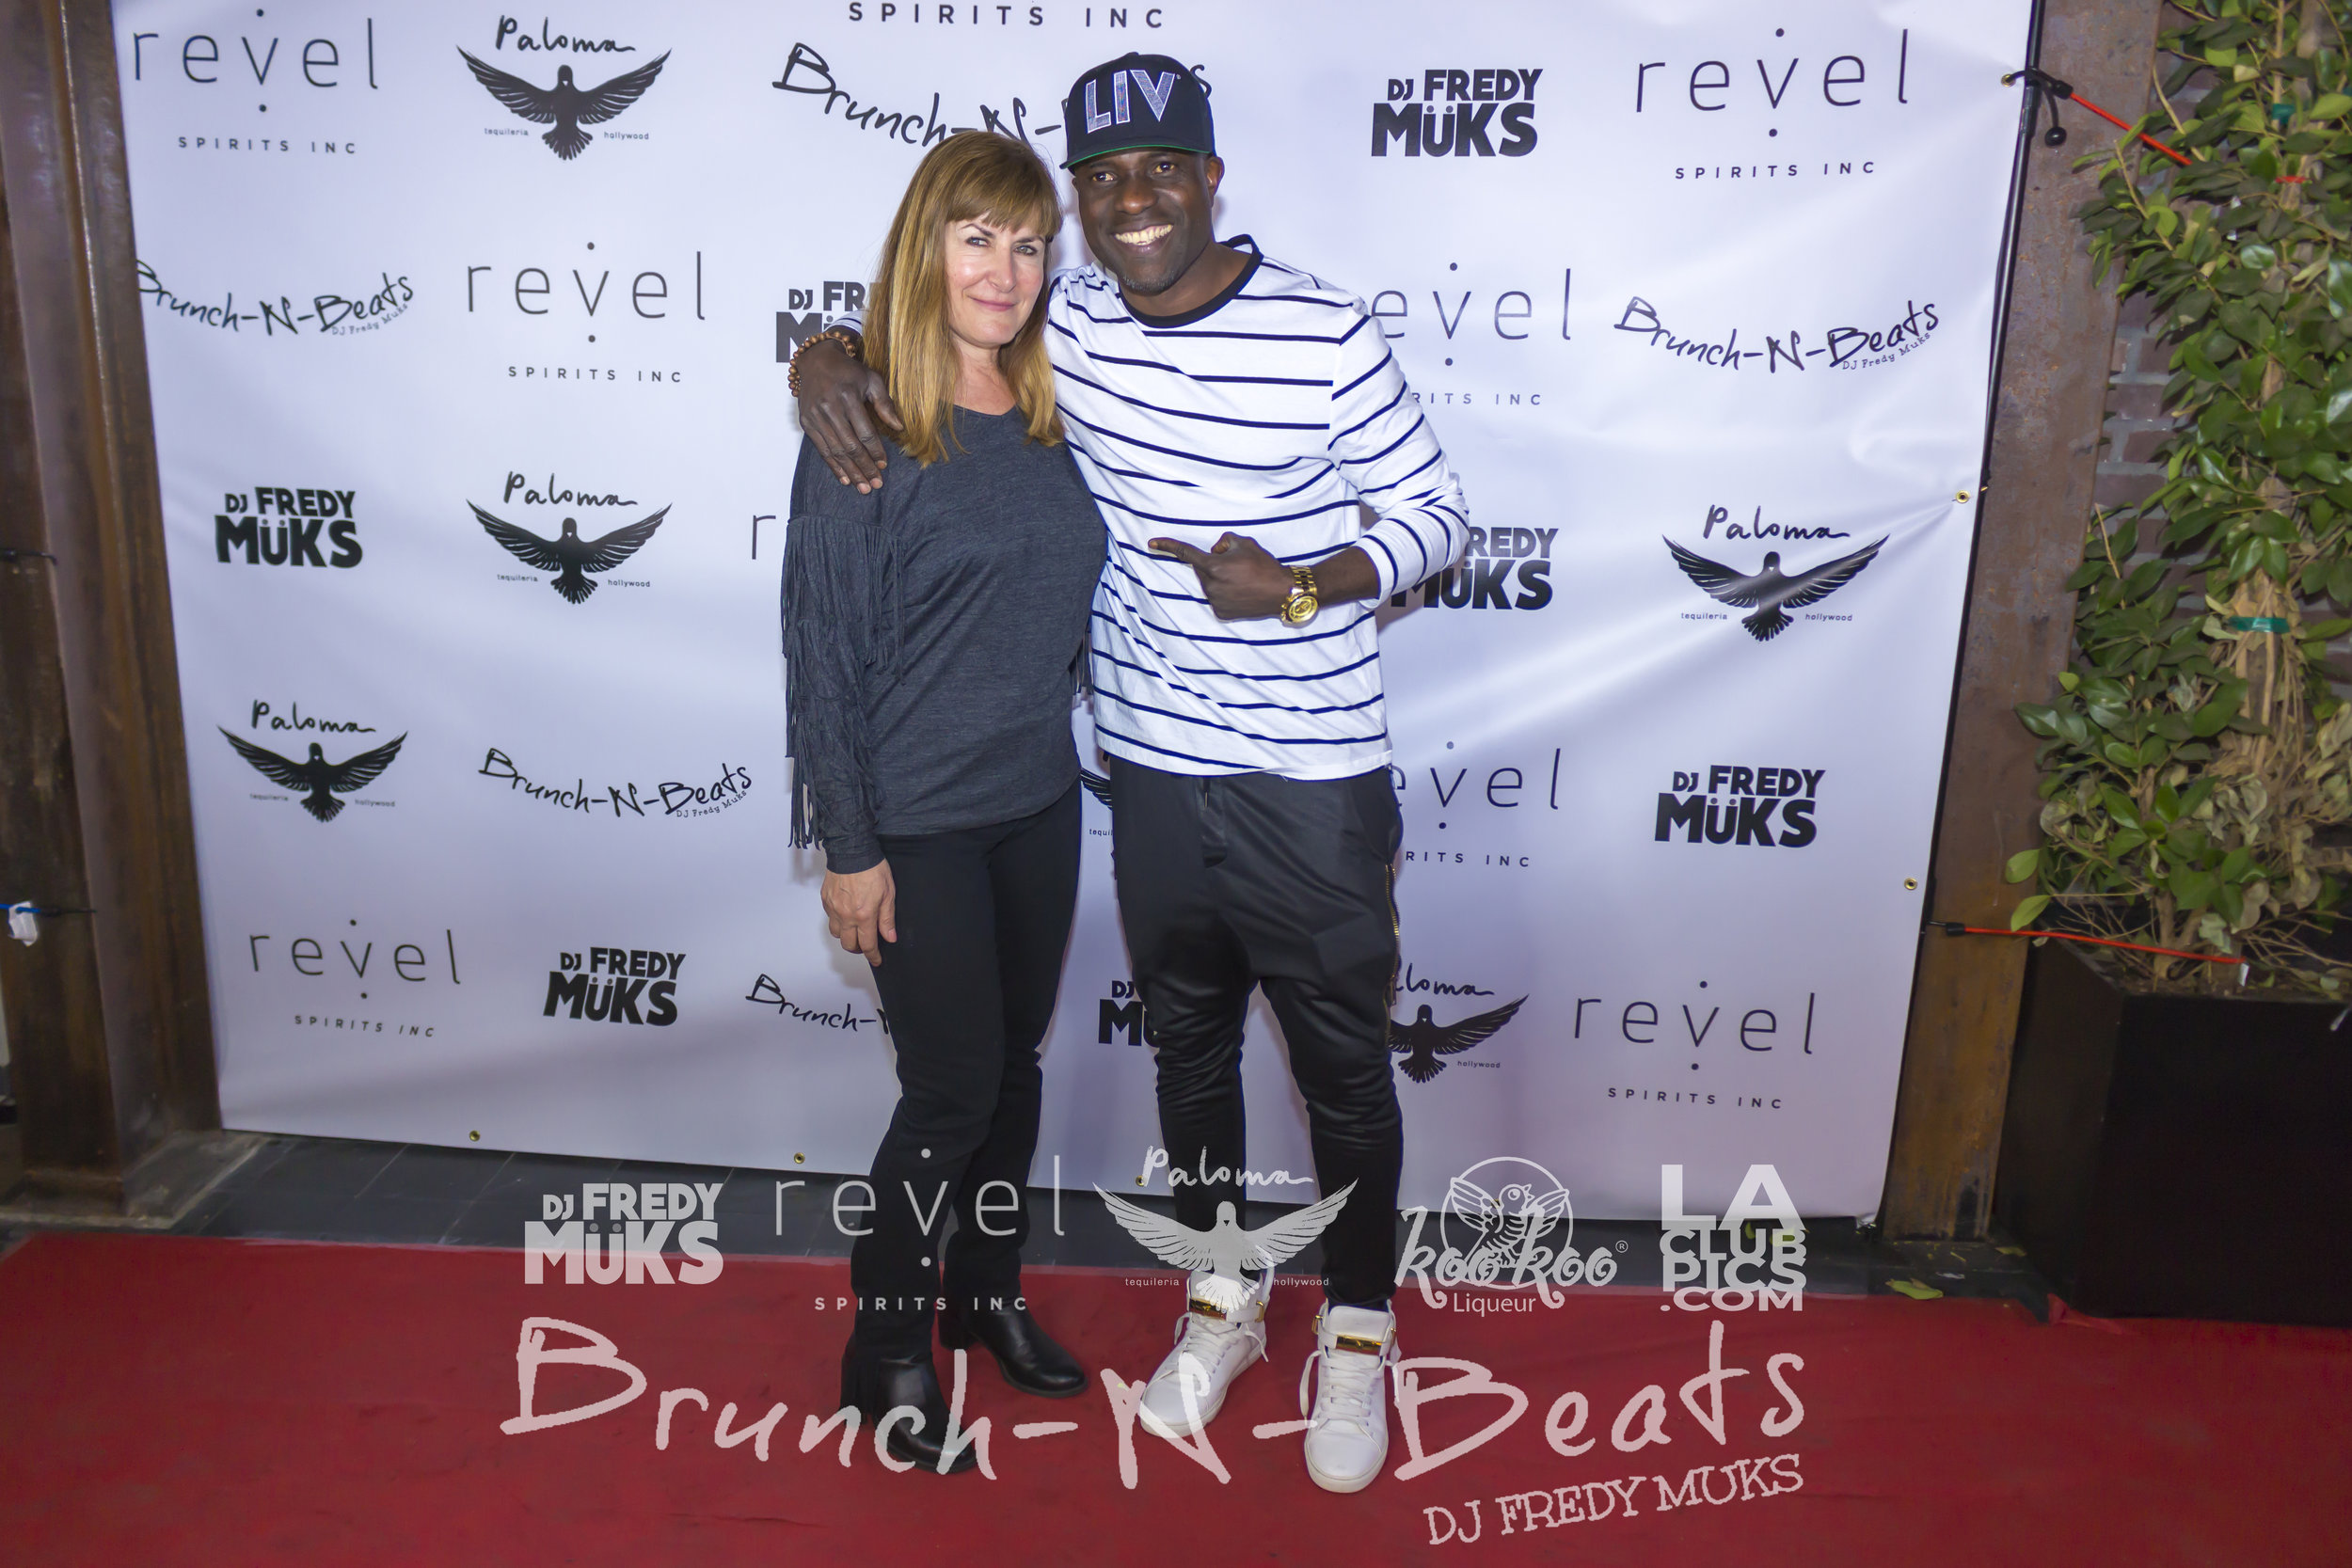 Brunch-N-Beats - Paloma Hollywood - 02-25-18_178.jpg